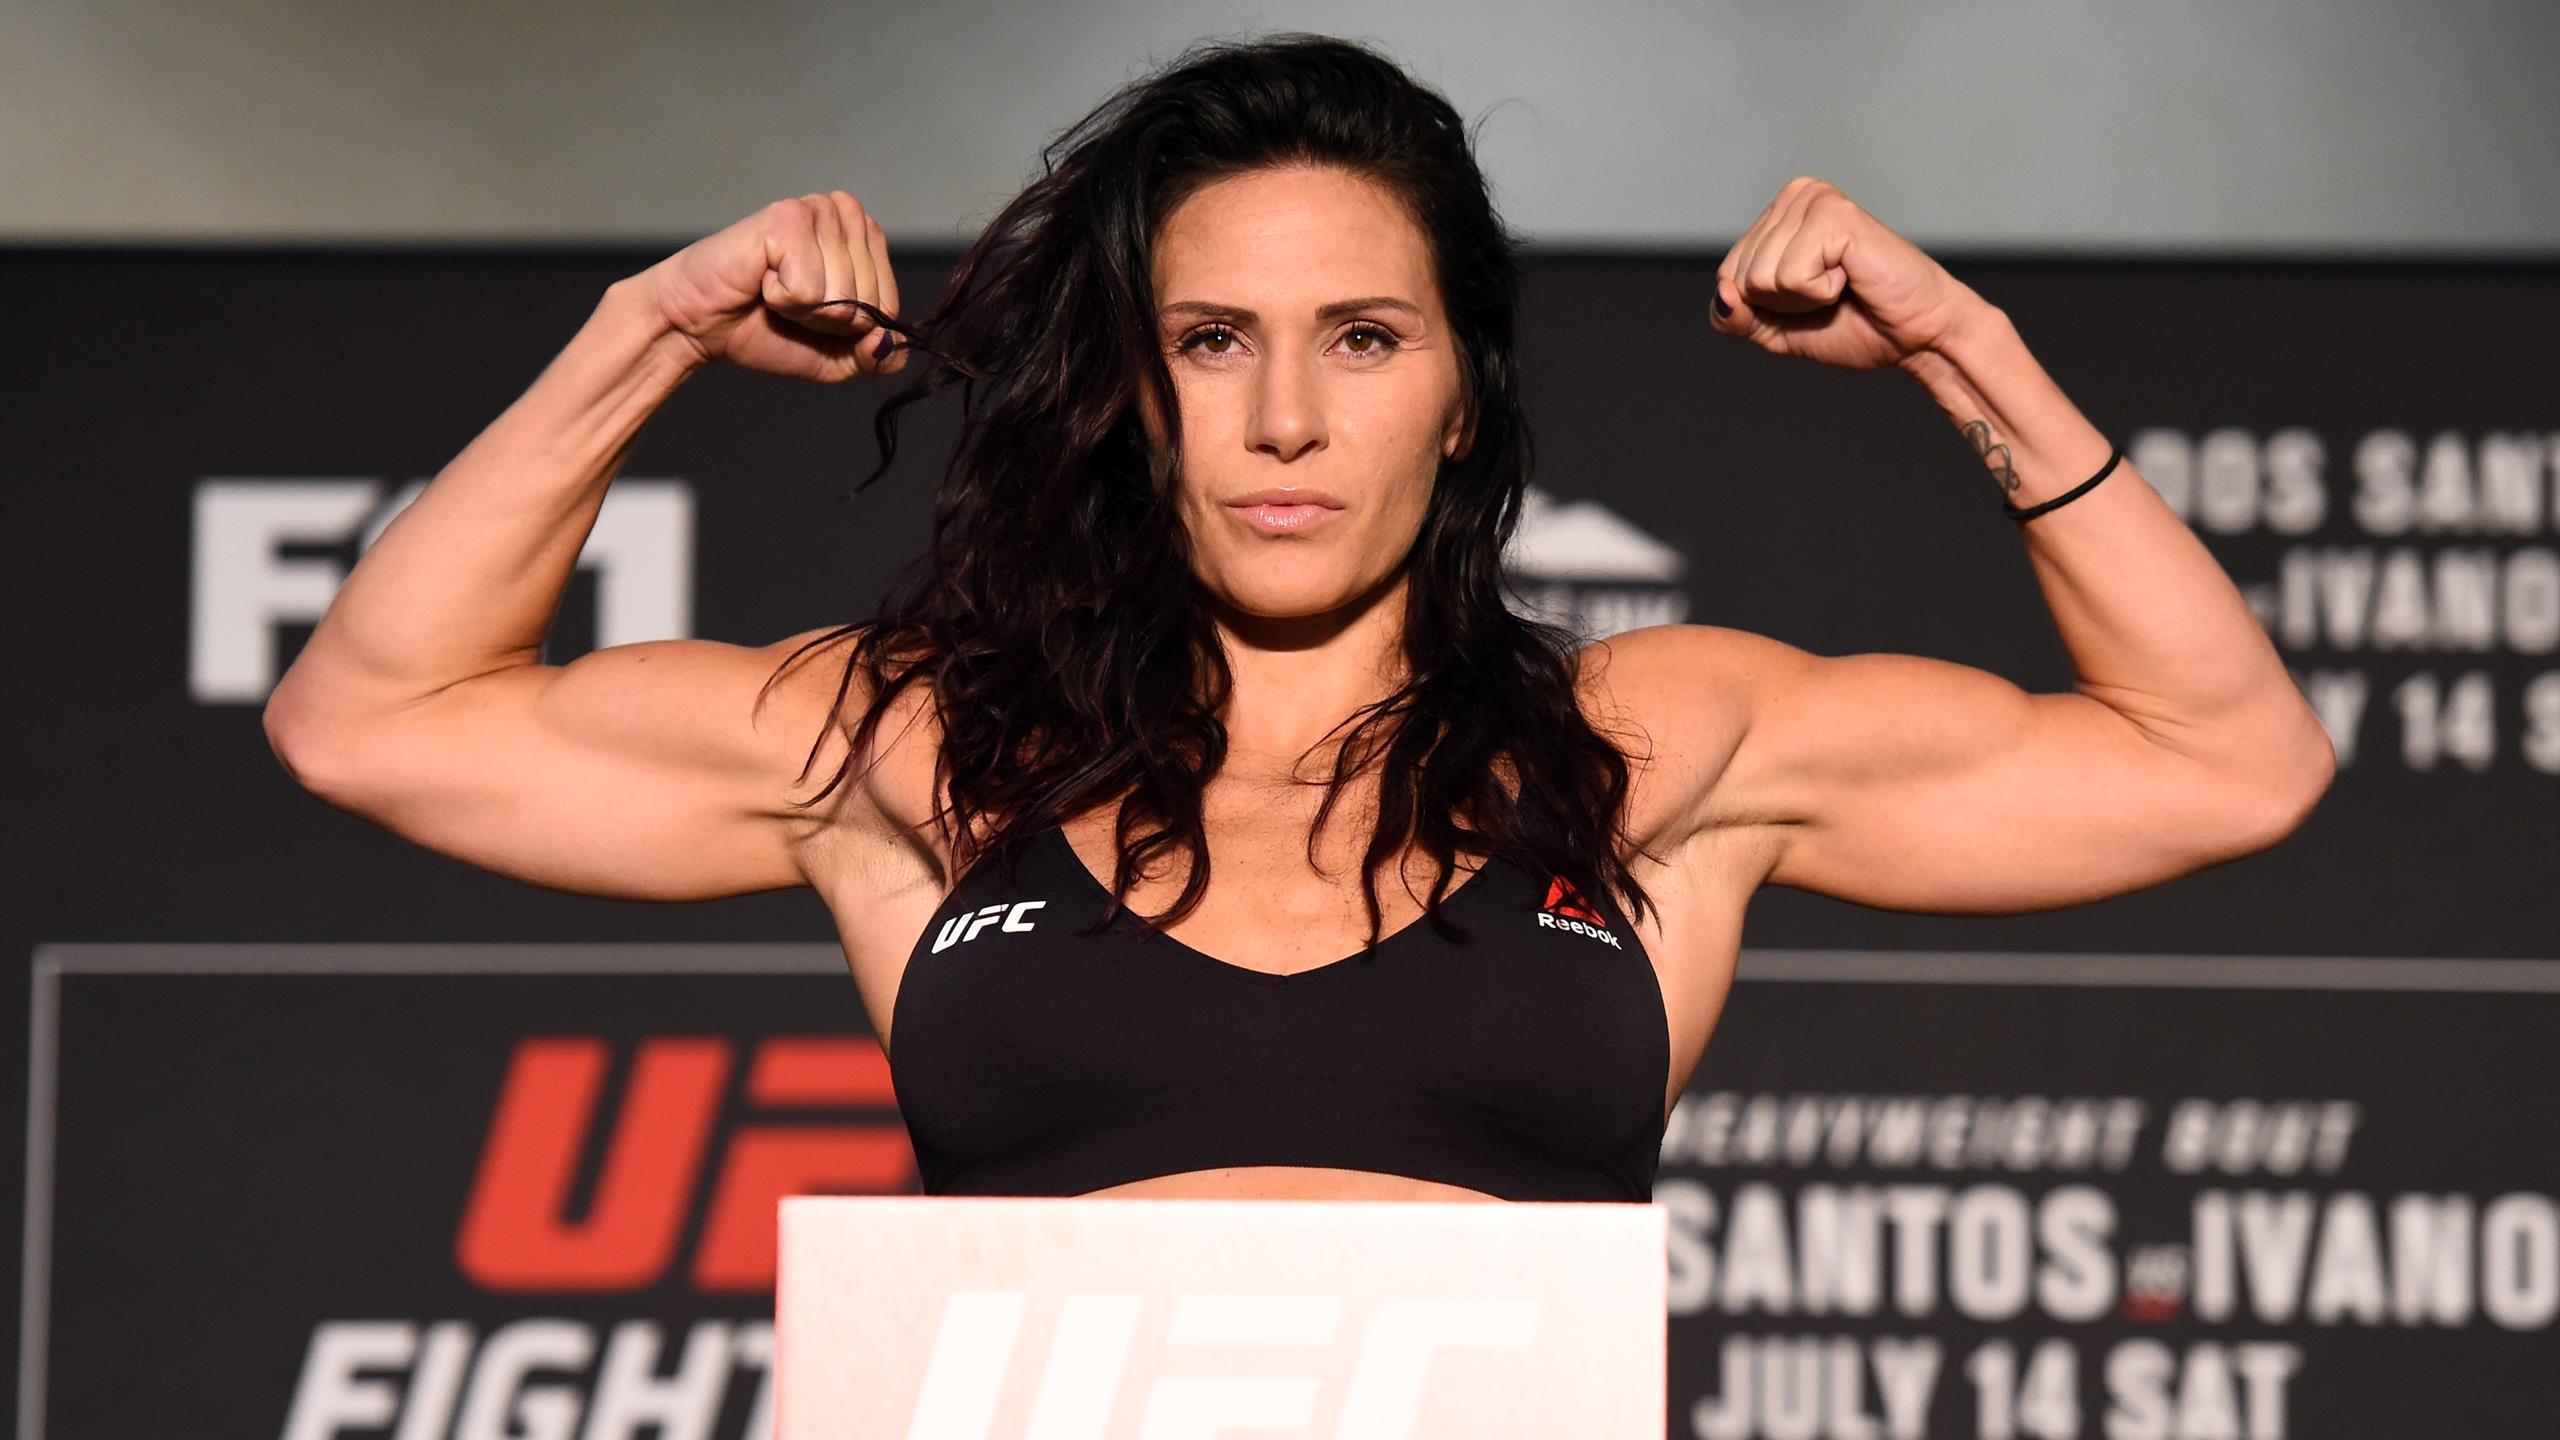 Боец UFC подала в суд на Холли Берри за обман